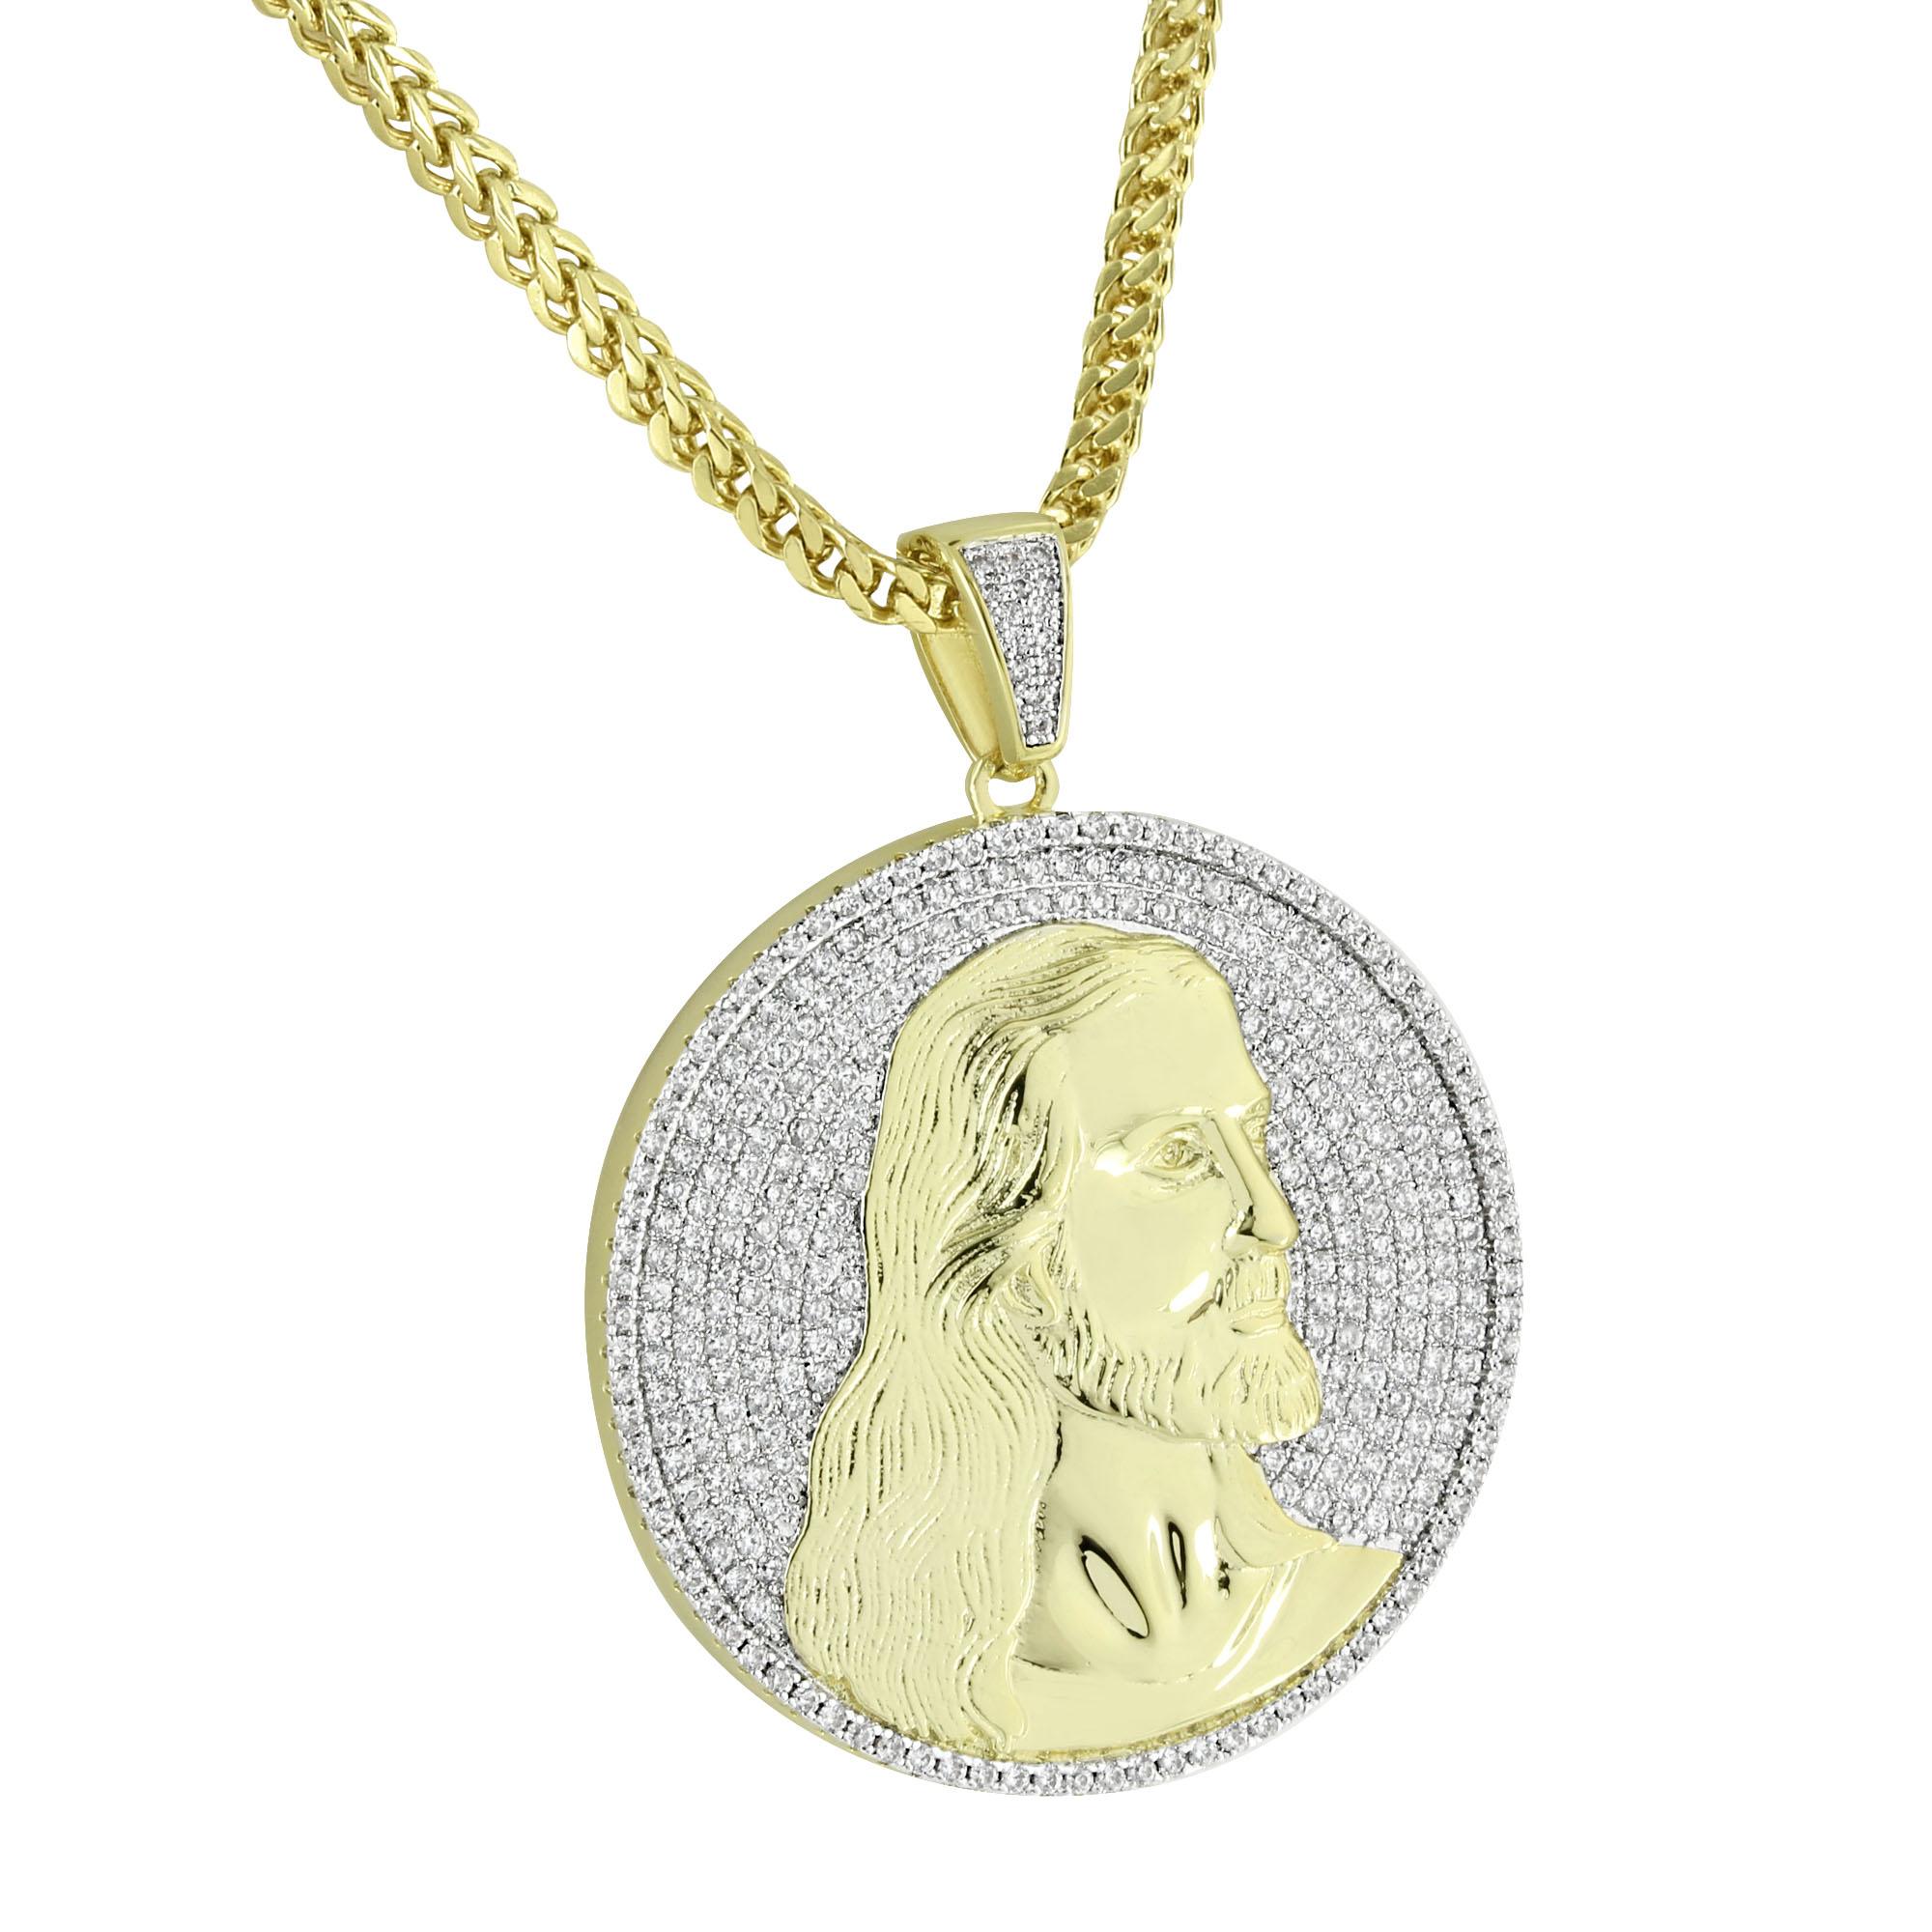 Jesus Christ Coin Pendant Designer Round Micro Pave Lab C...